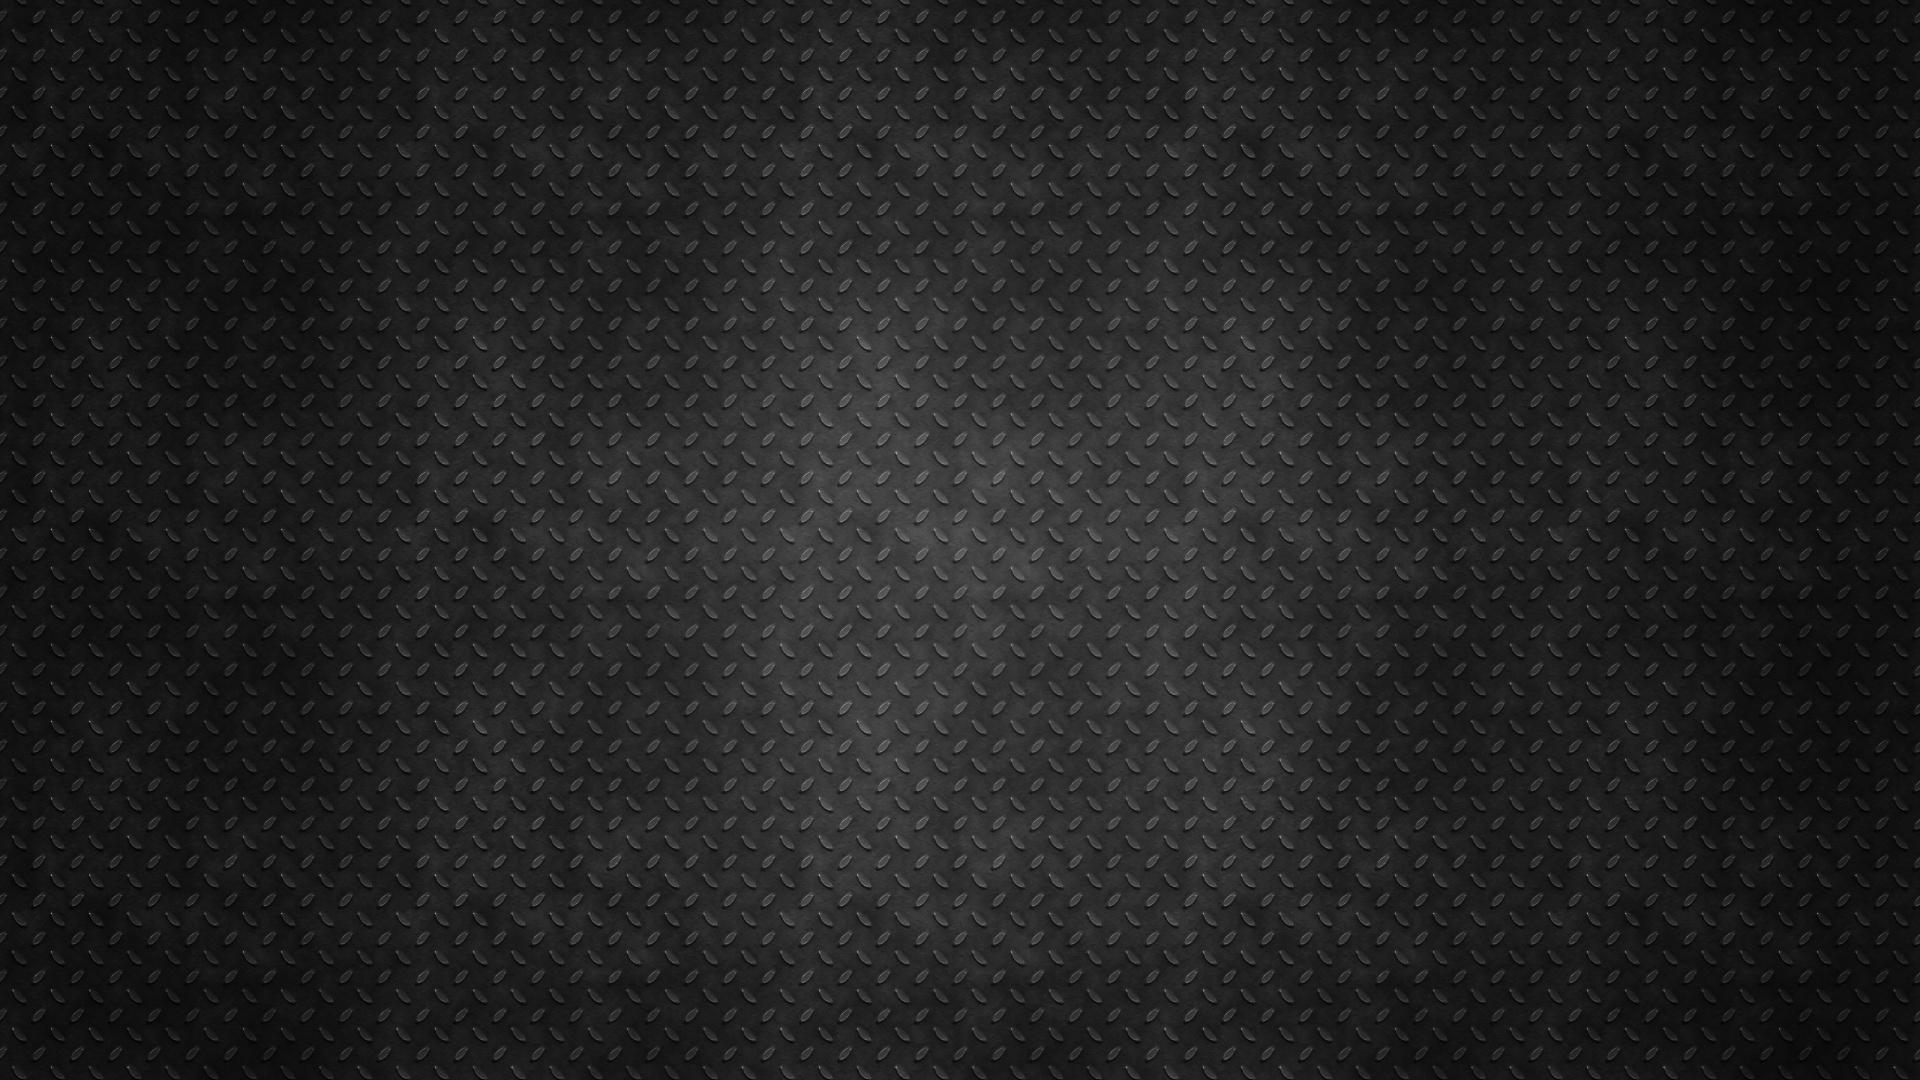 Nuke HD Wallpapers 1080p